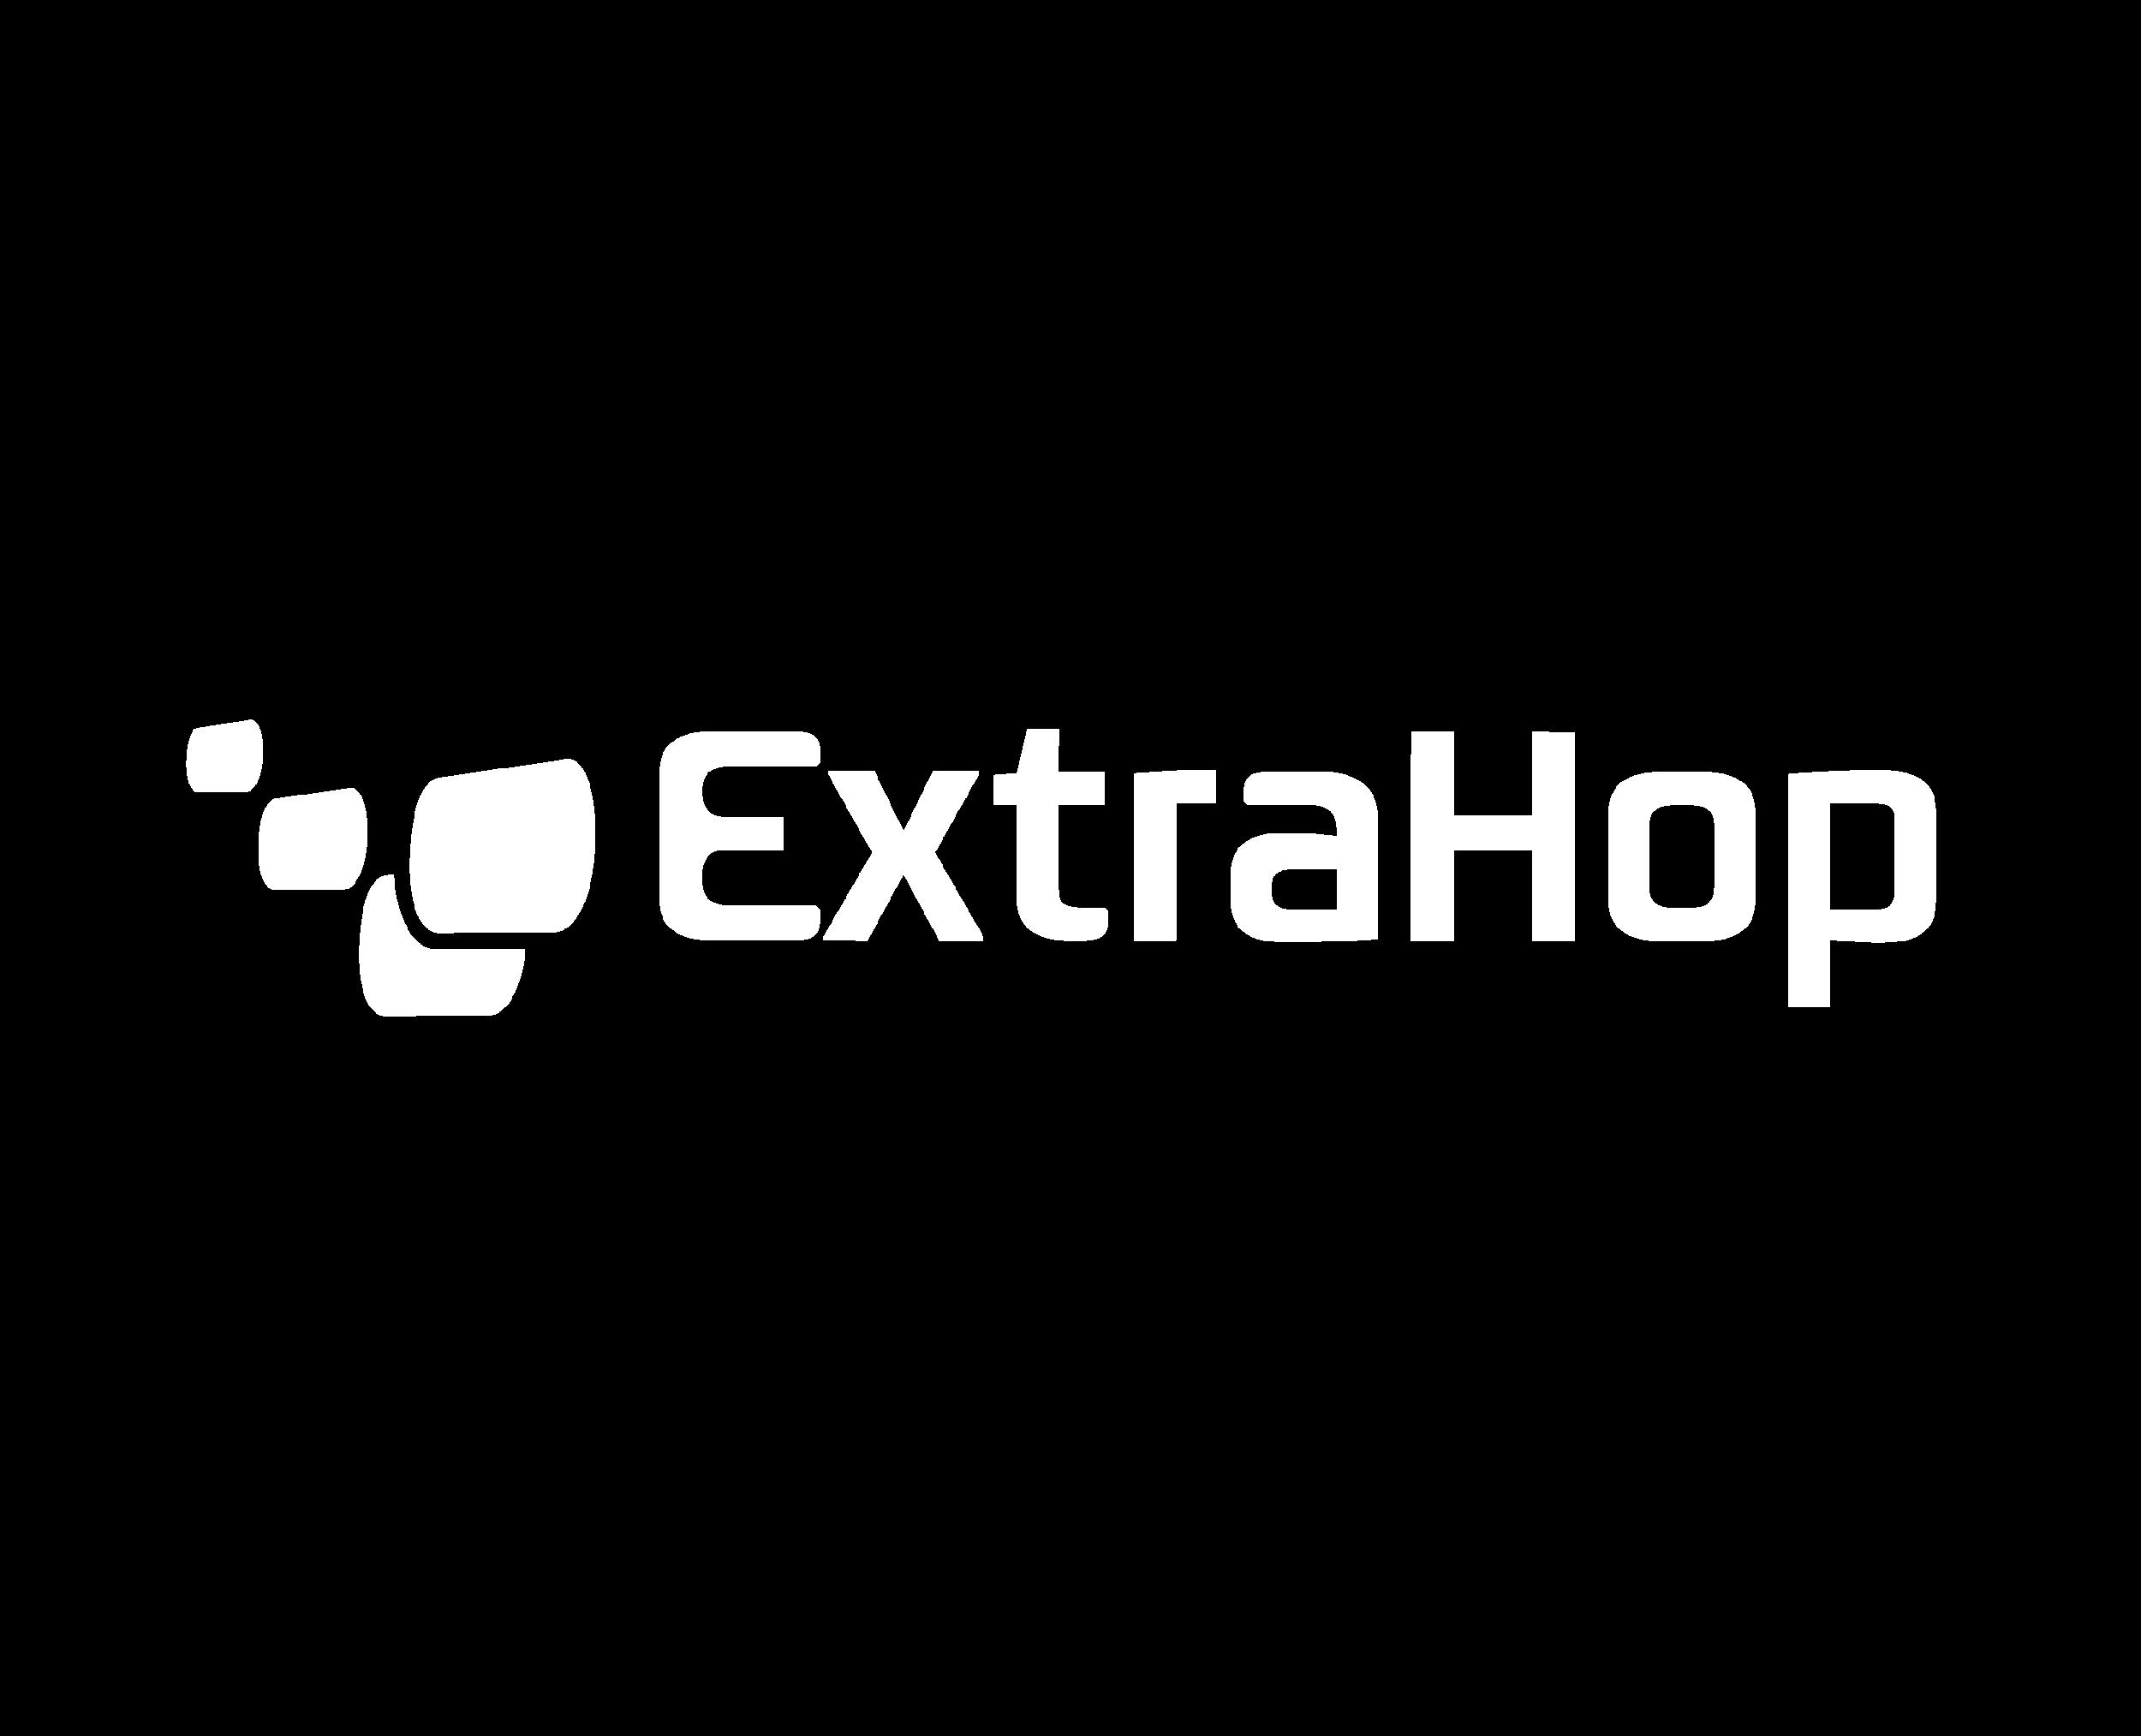 logo_extrahop_2.png